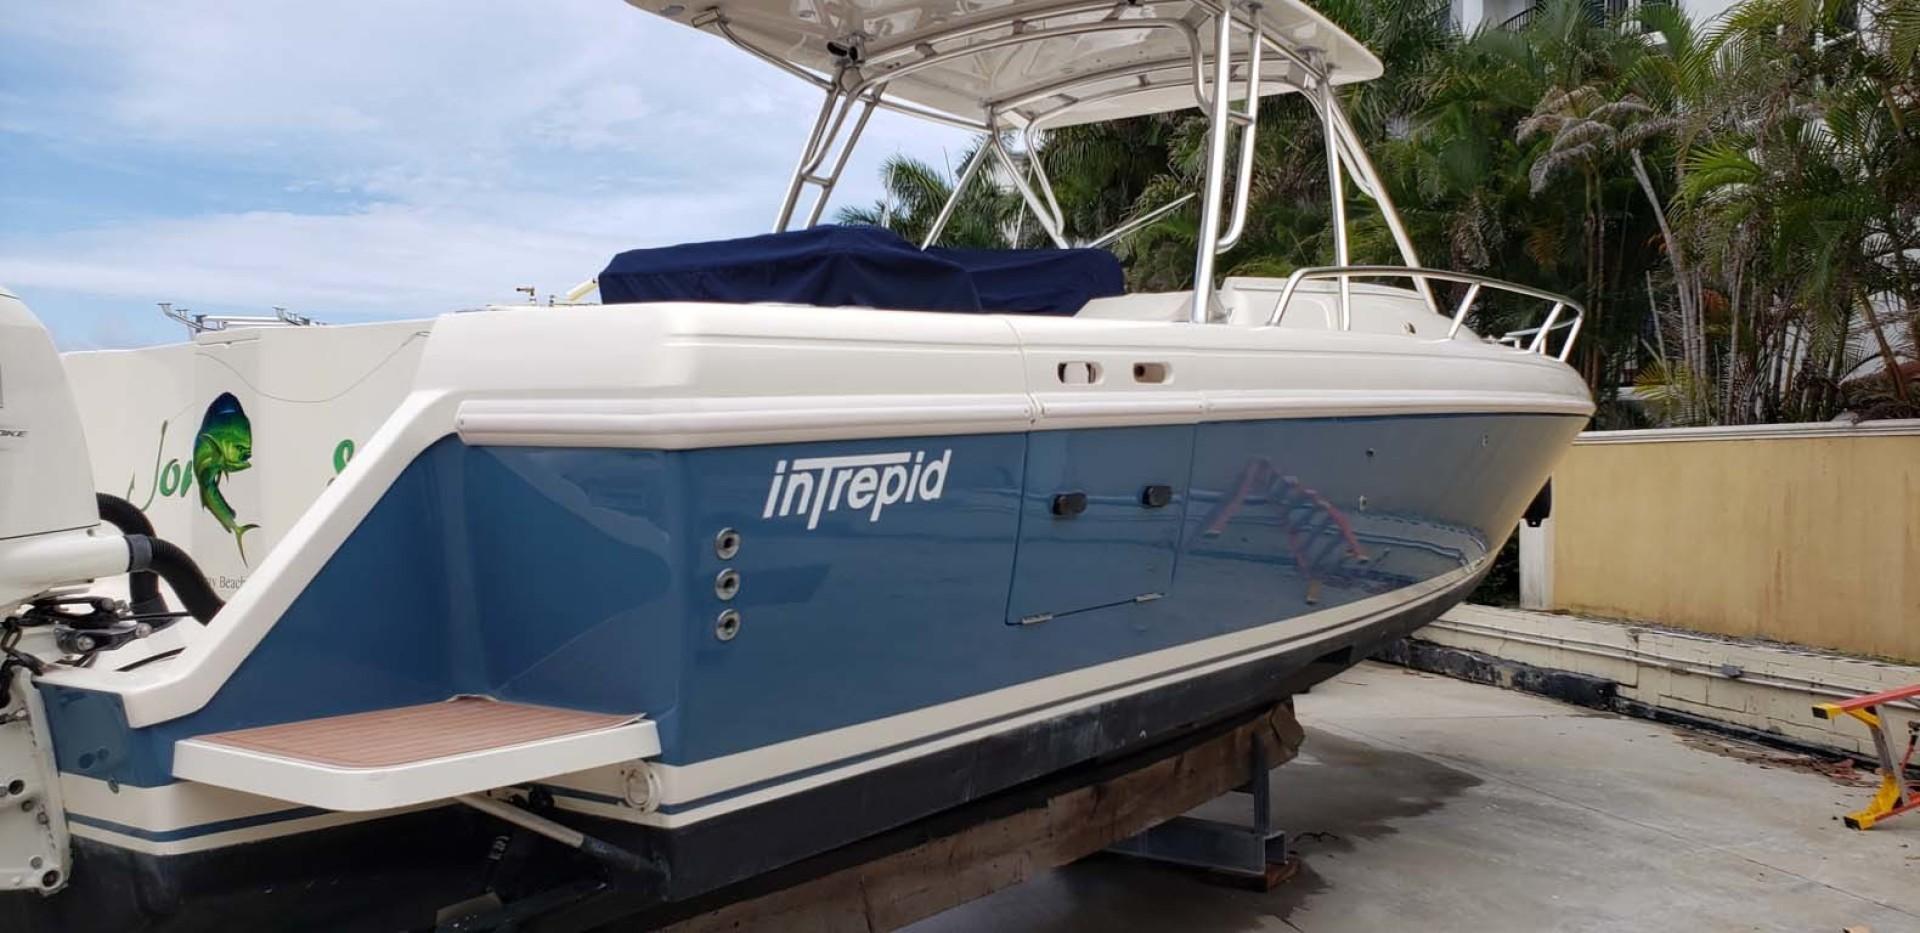 Intrepid-348 Walkaround 2003 -West Palm Beach-Florida-United States-1428857 | Thumbnail